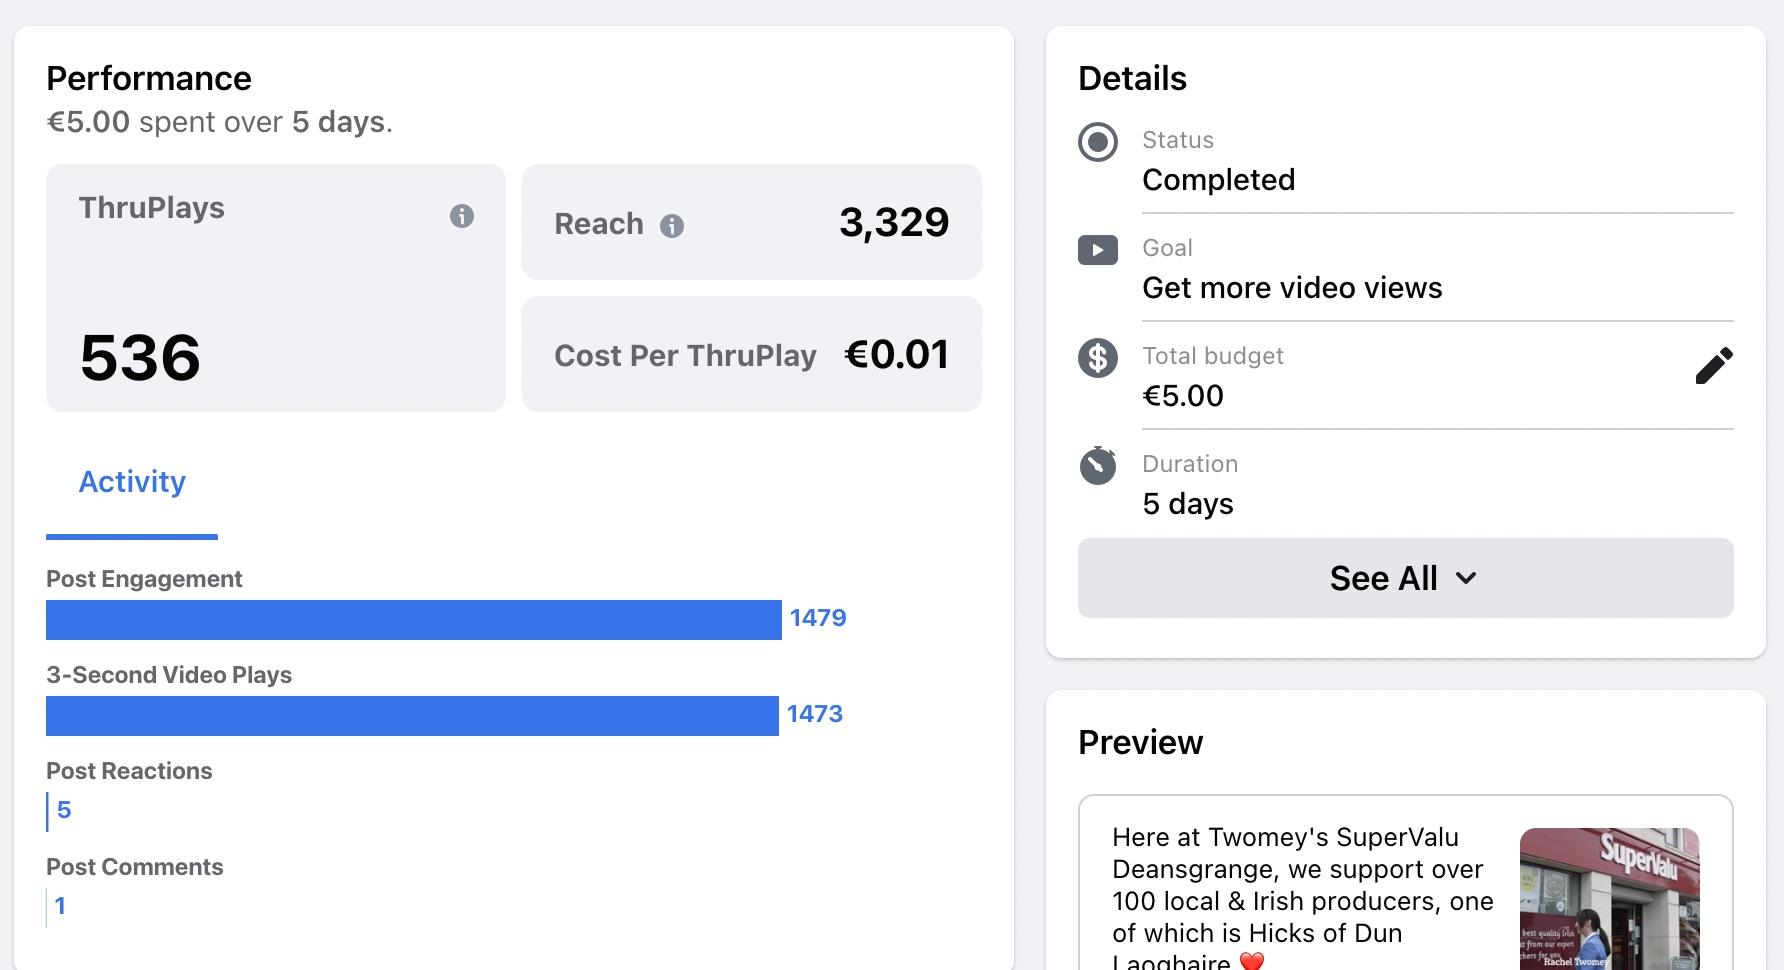 Supervalu Deansgrange social media advertising results